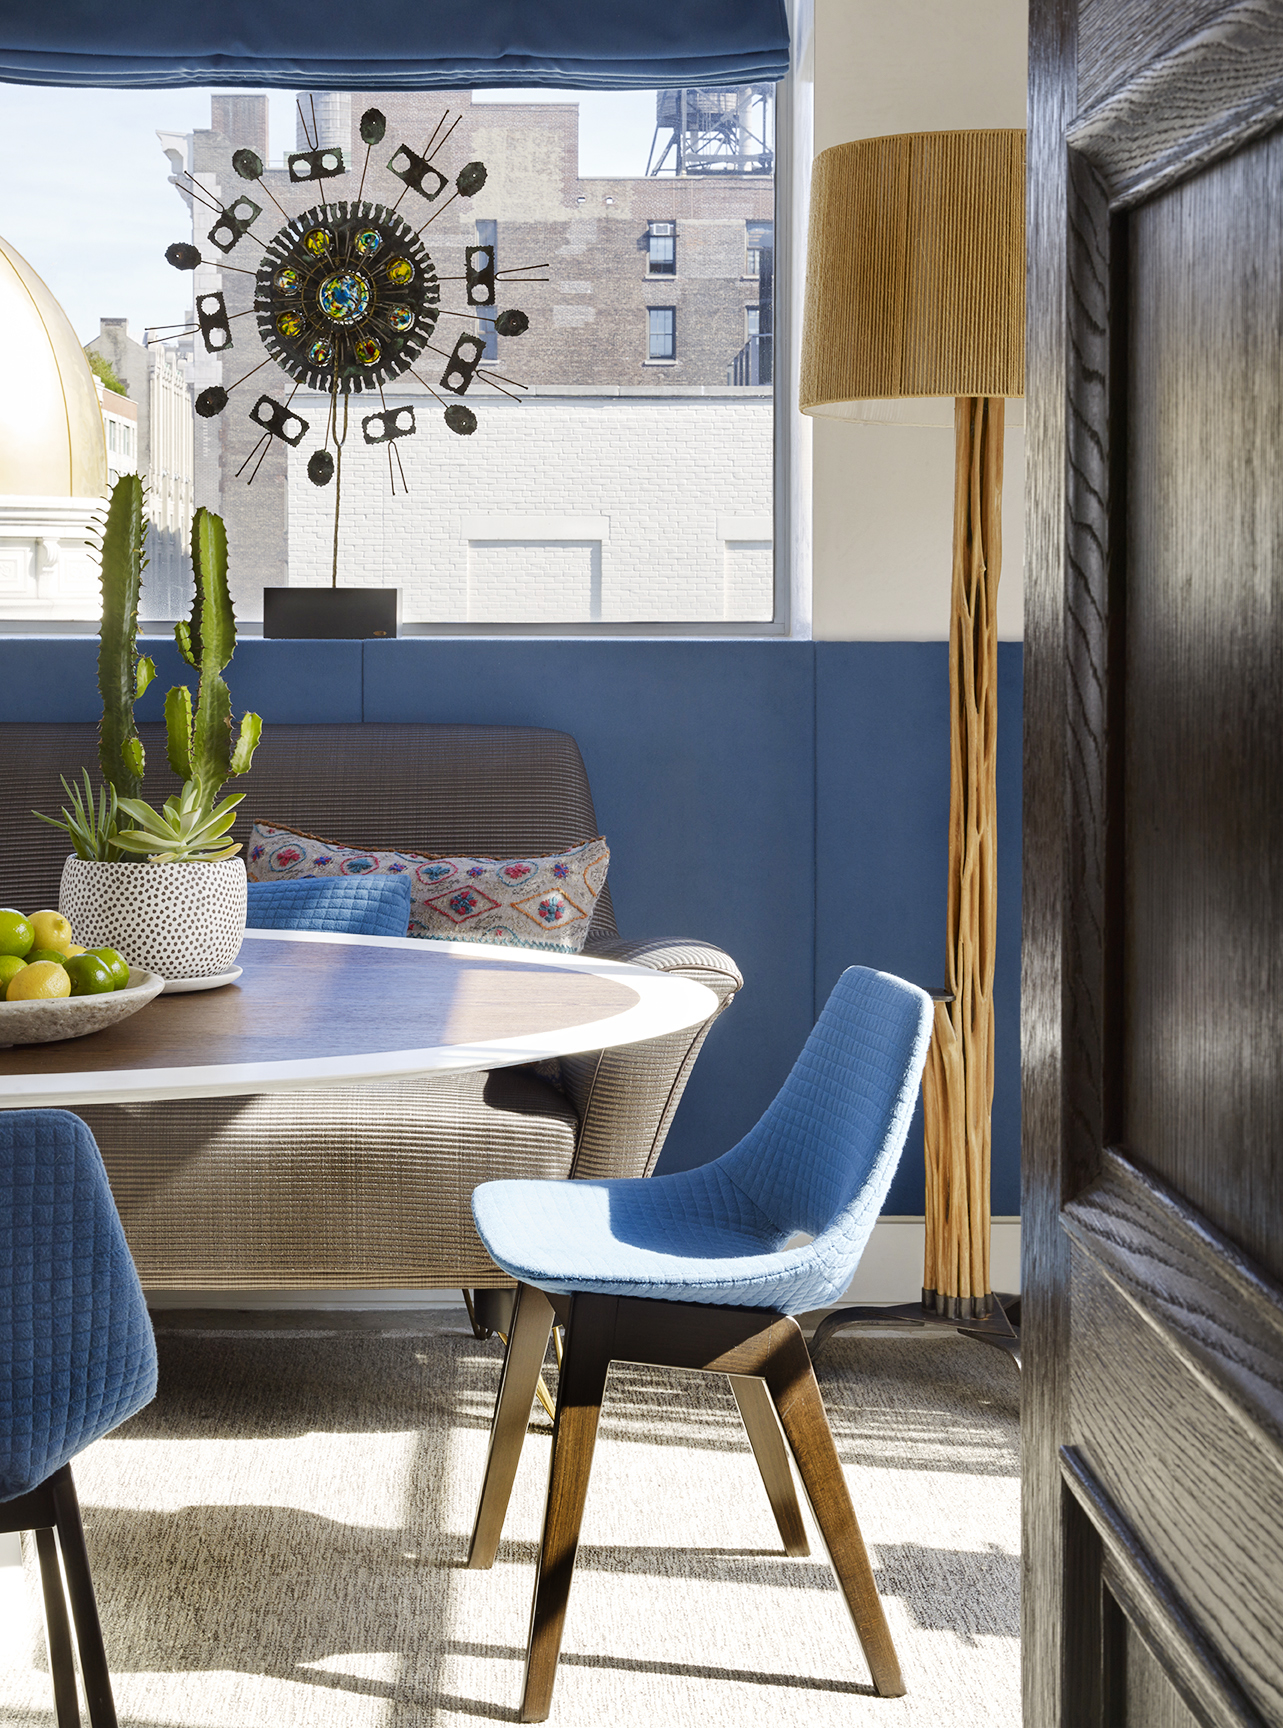 LUXE_121 W21_Breakfast Room_2_photo Peter Murdock.jpg